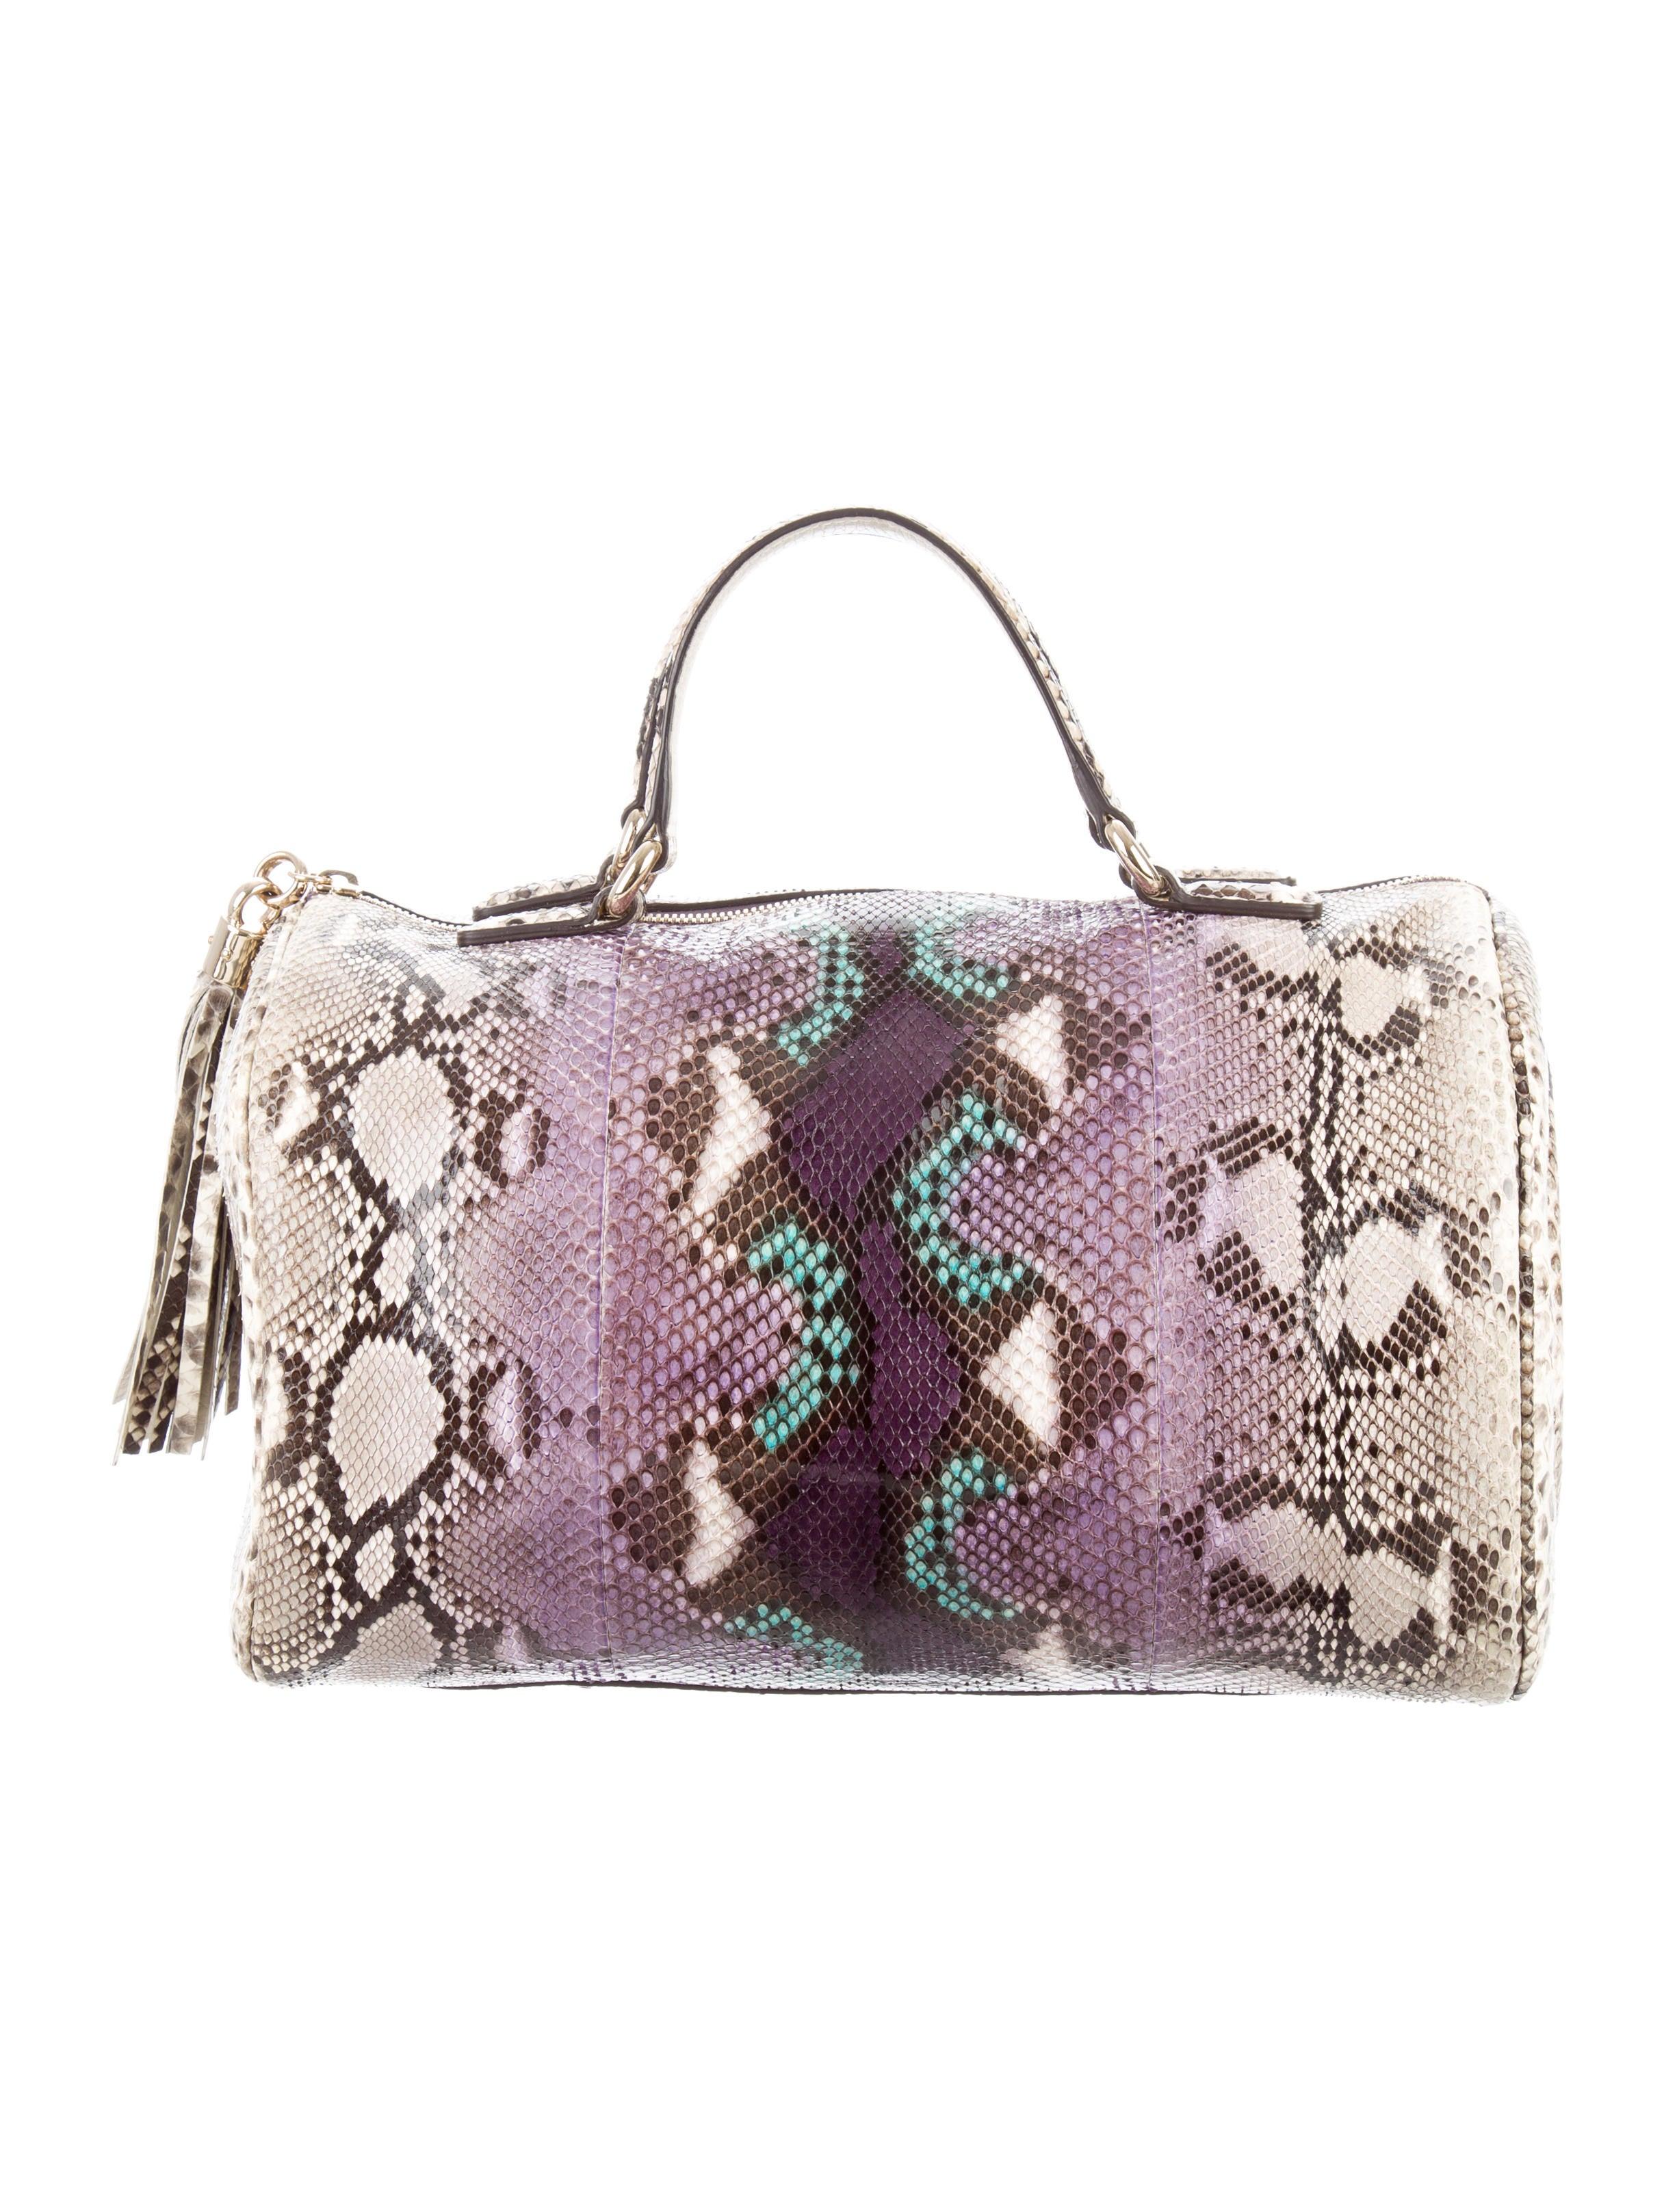 Boston Bag Patchwork Tutorial: Gucci Python Soho Boston Bag - Handbags - GUC162948